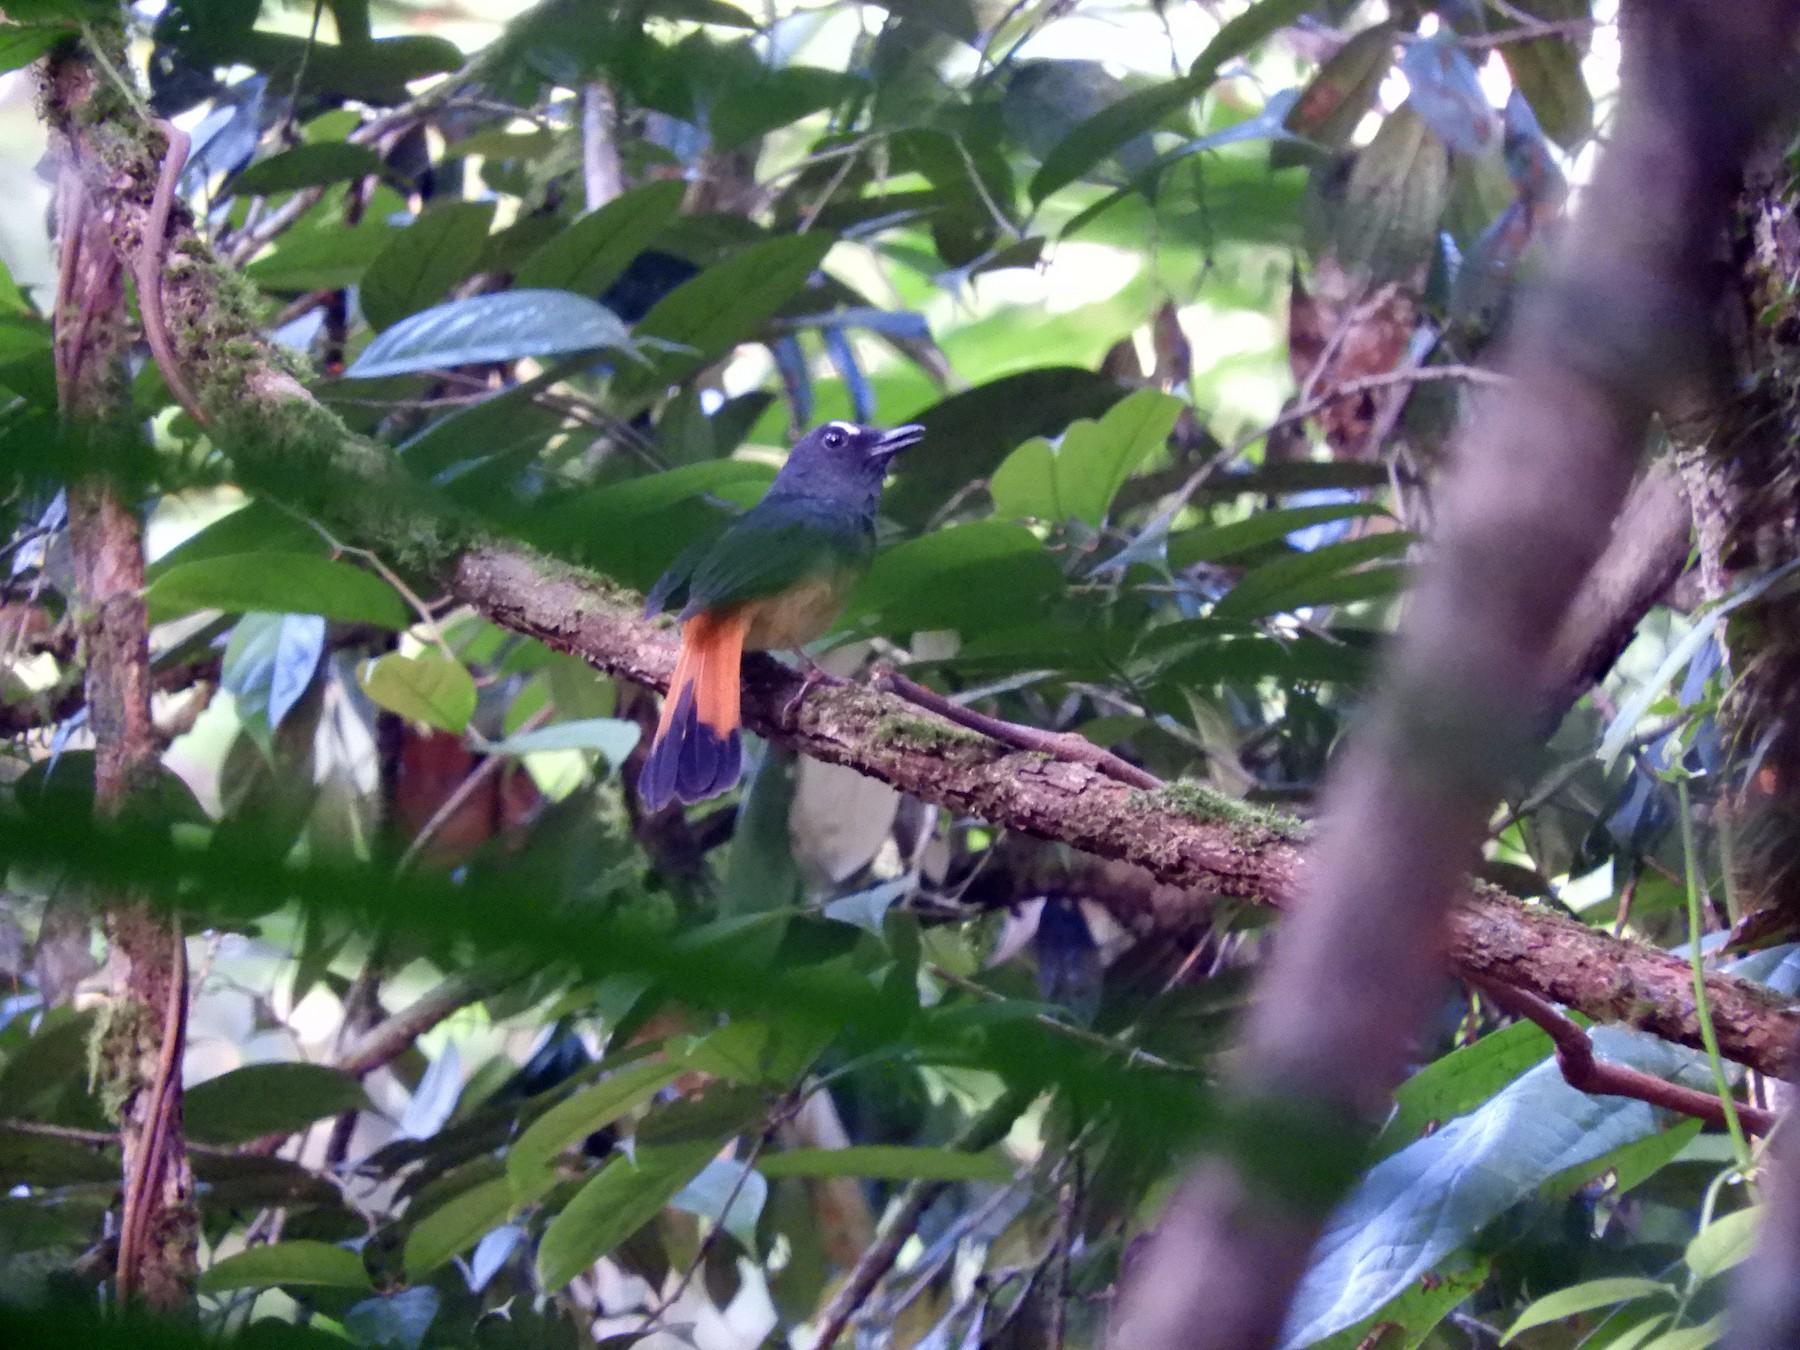 Rufous-tailed Shama - Oliver Tan